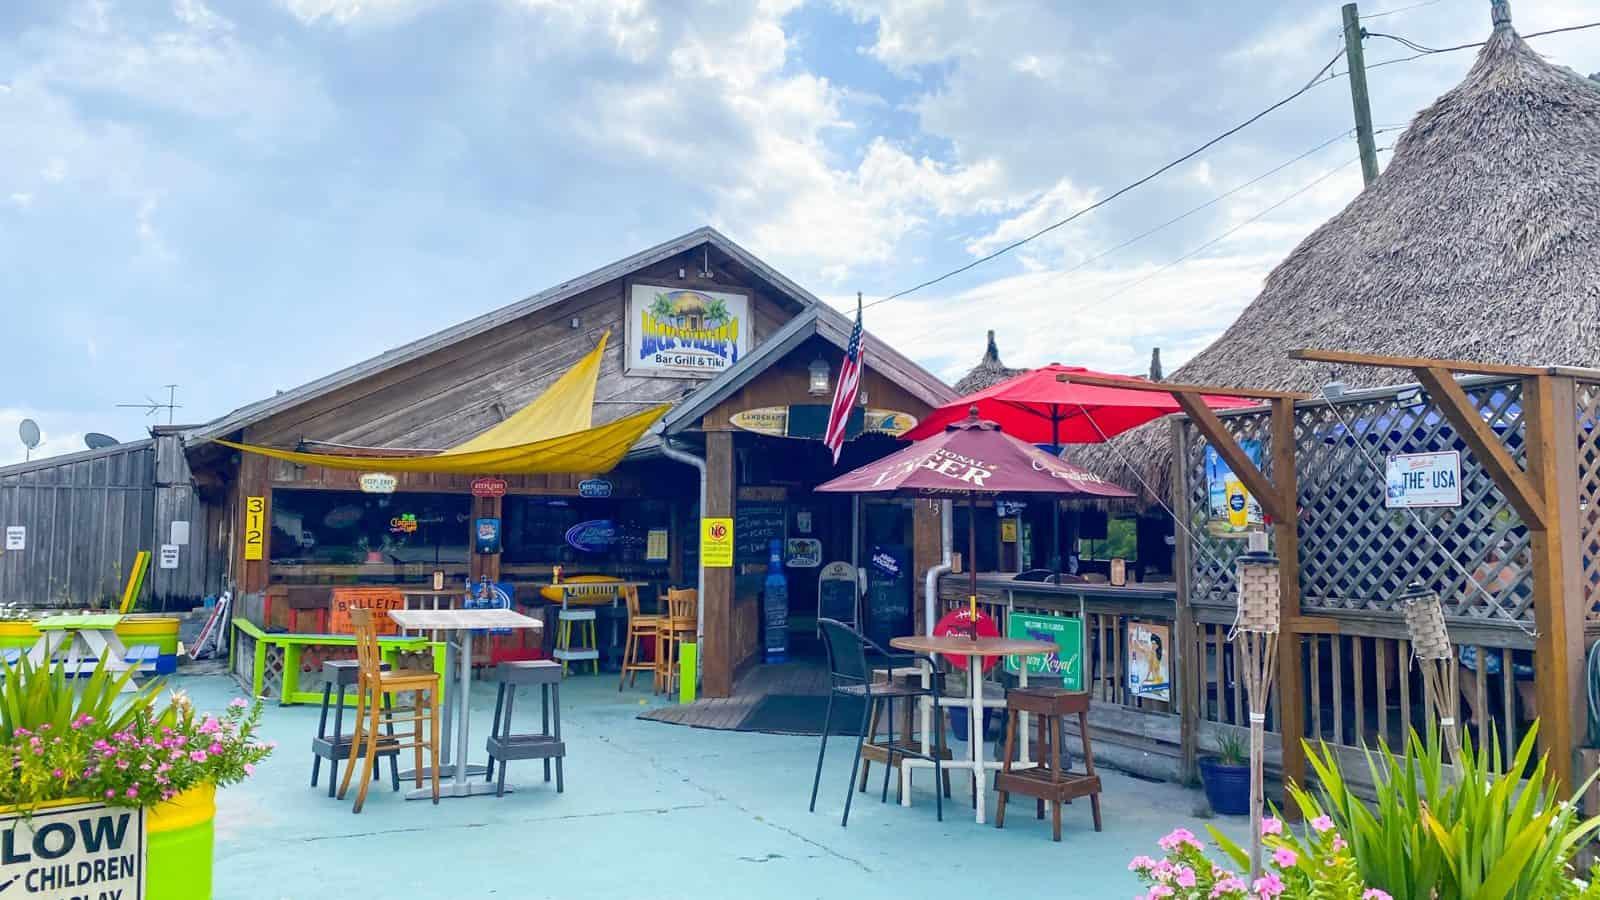 Jack Willies Tiki bar is one of the best outdoor restaurants in Oldsmar